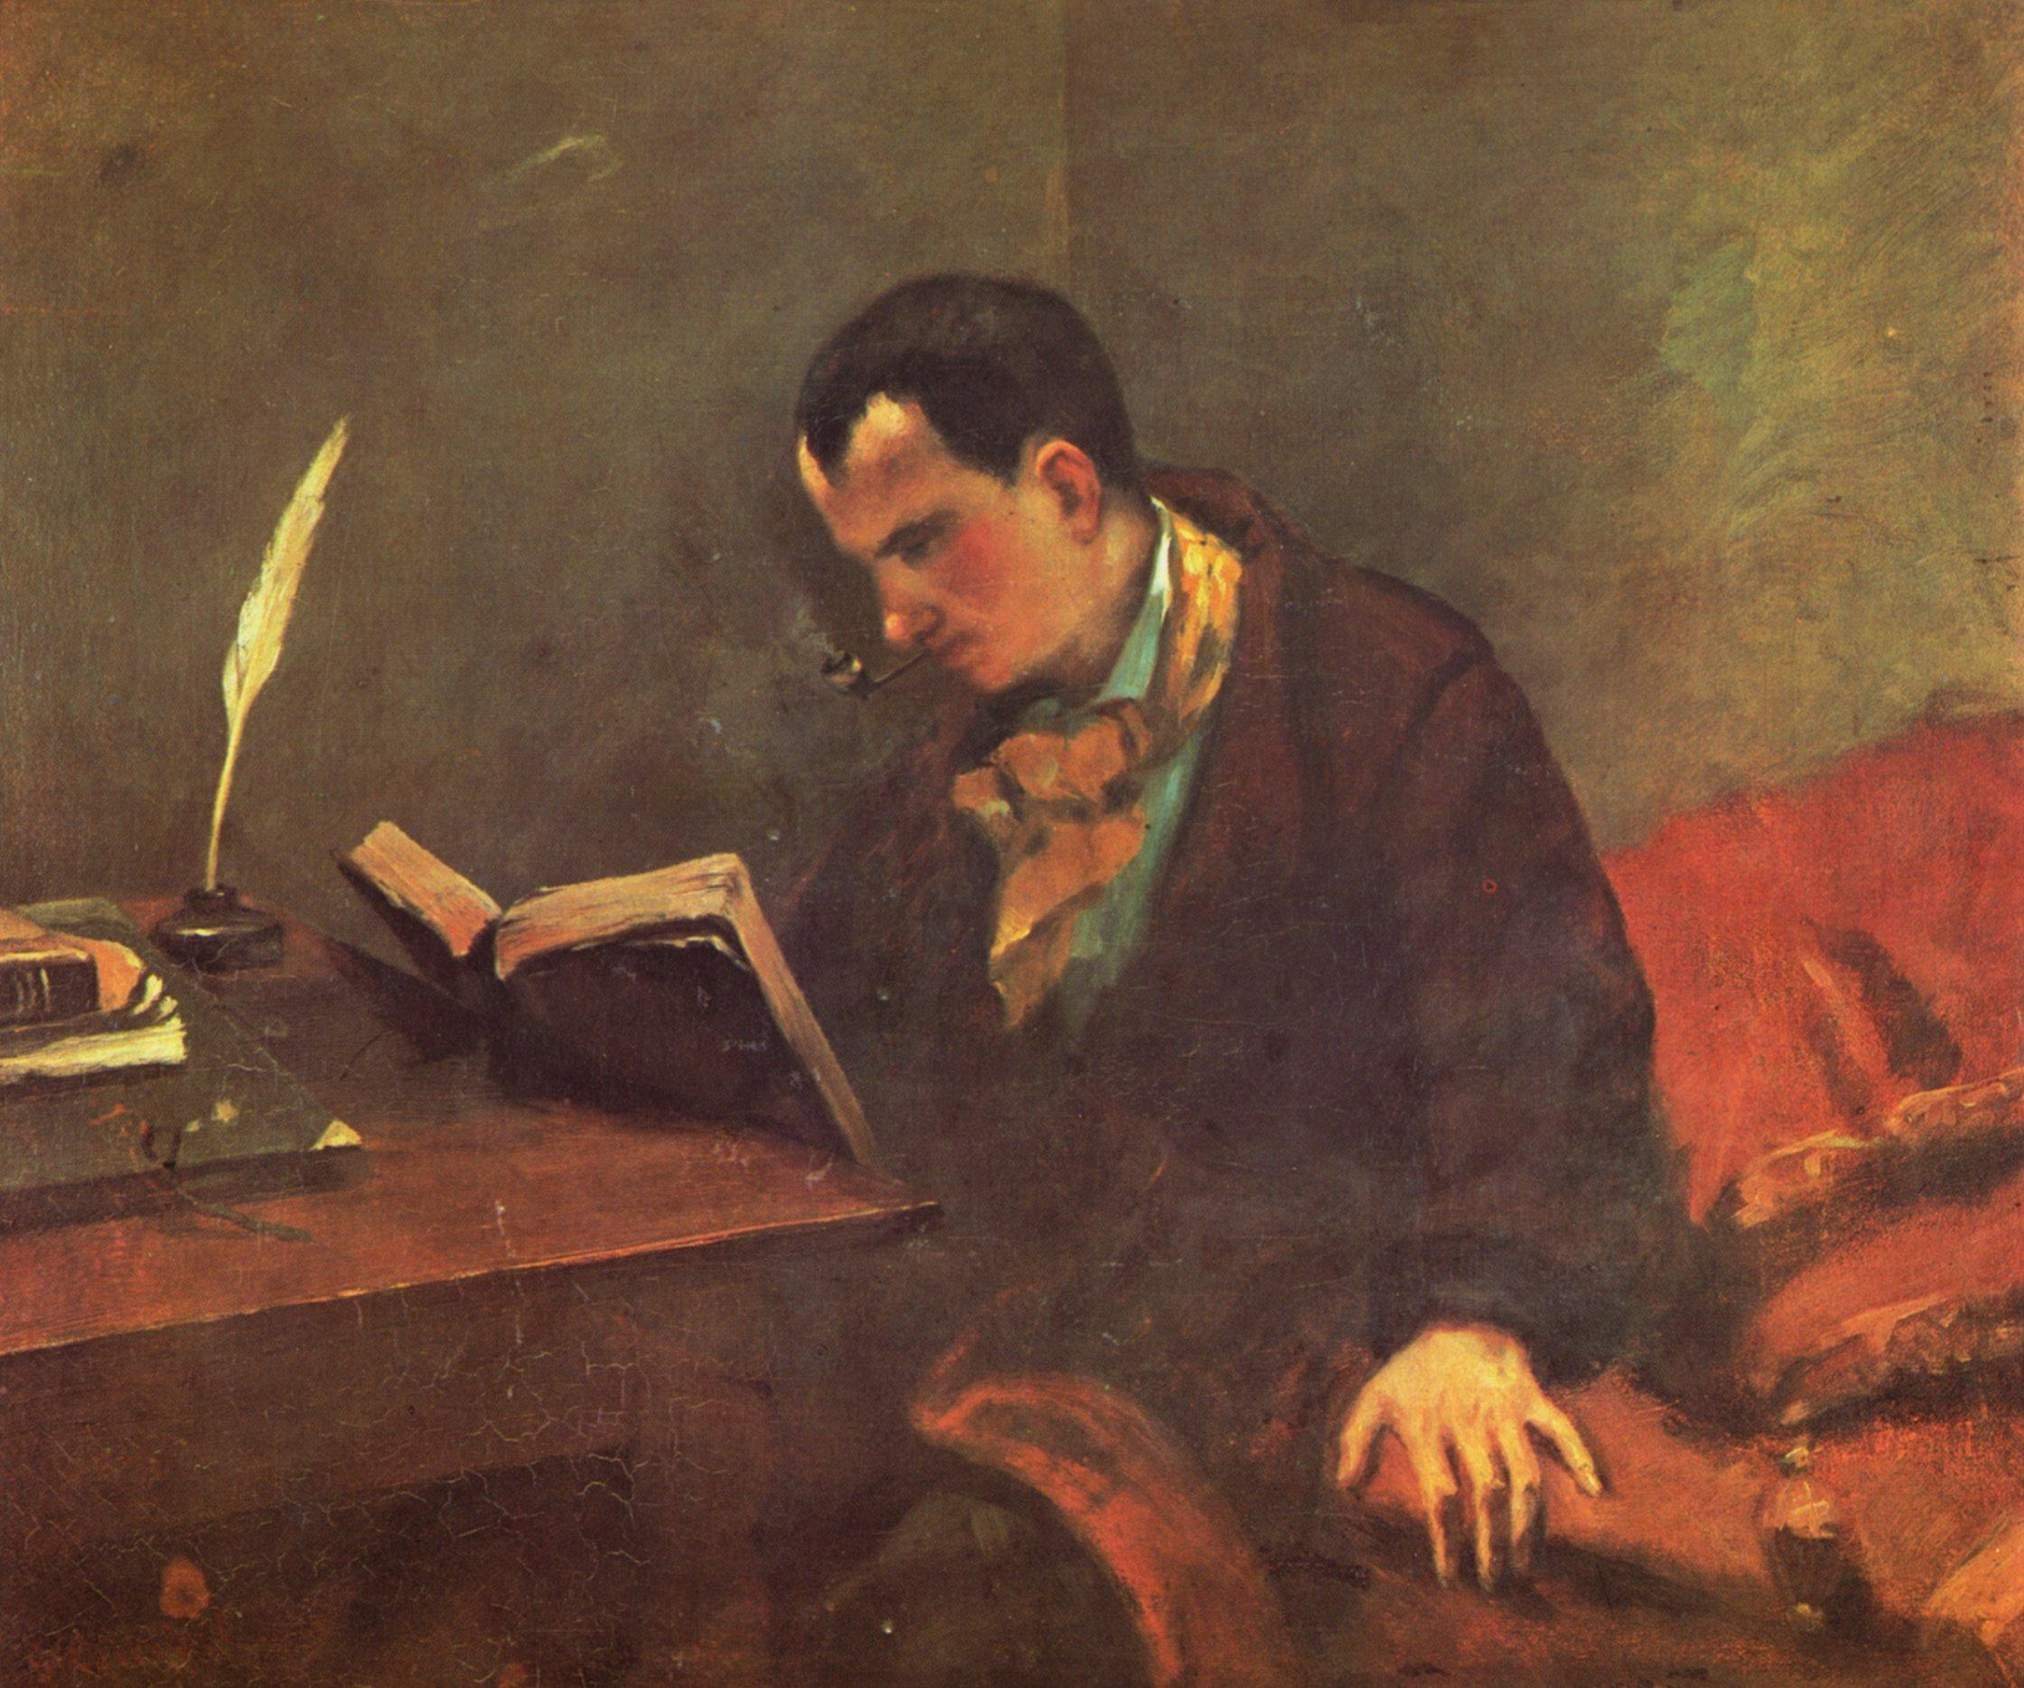 Baudelaire-Manet